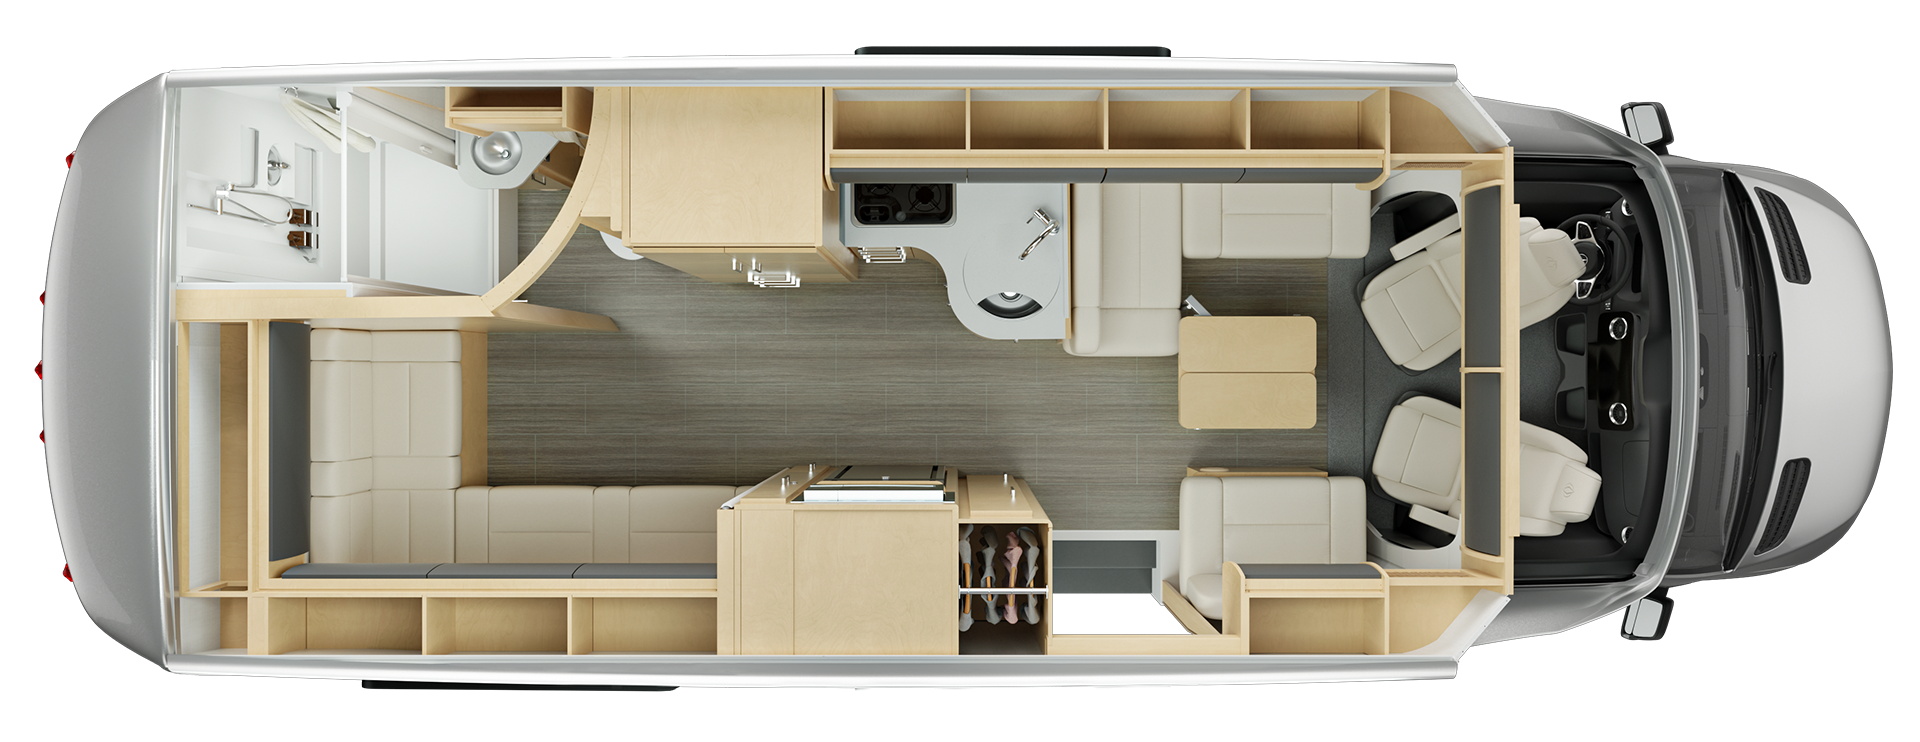 Serenity Floorplan